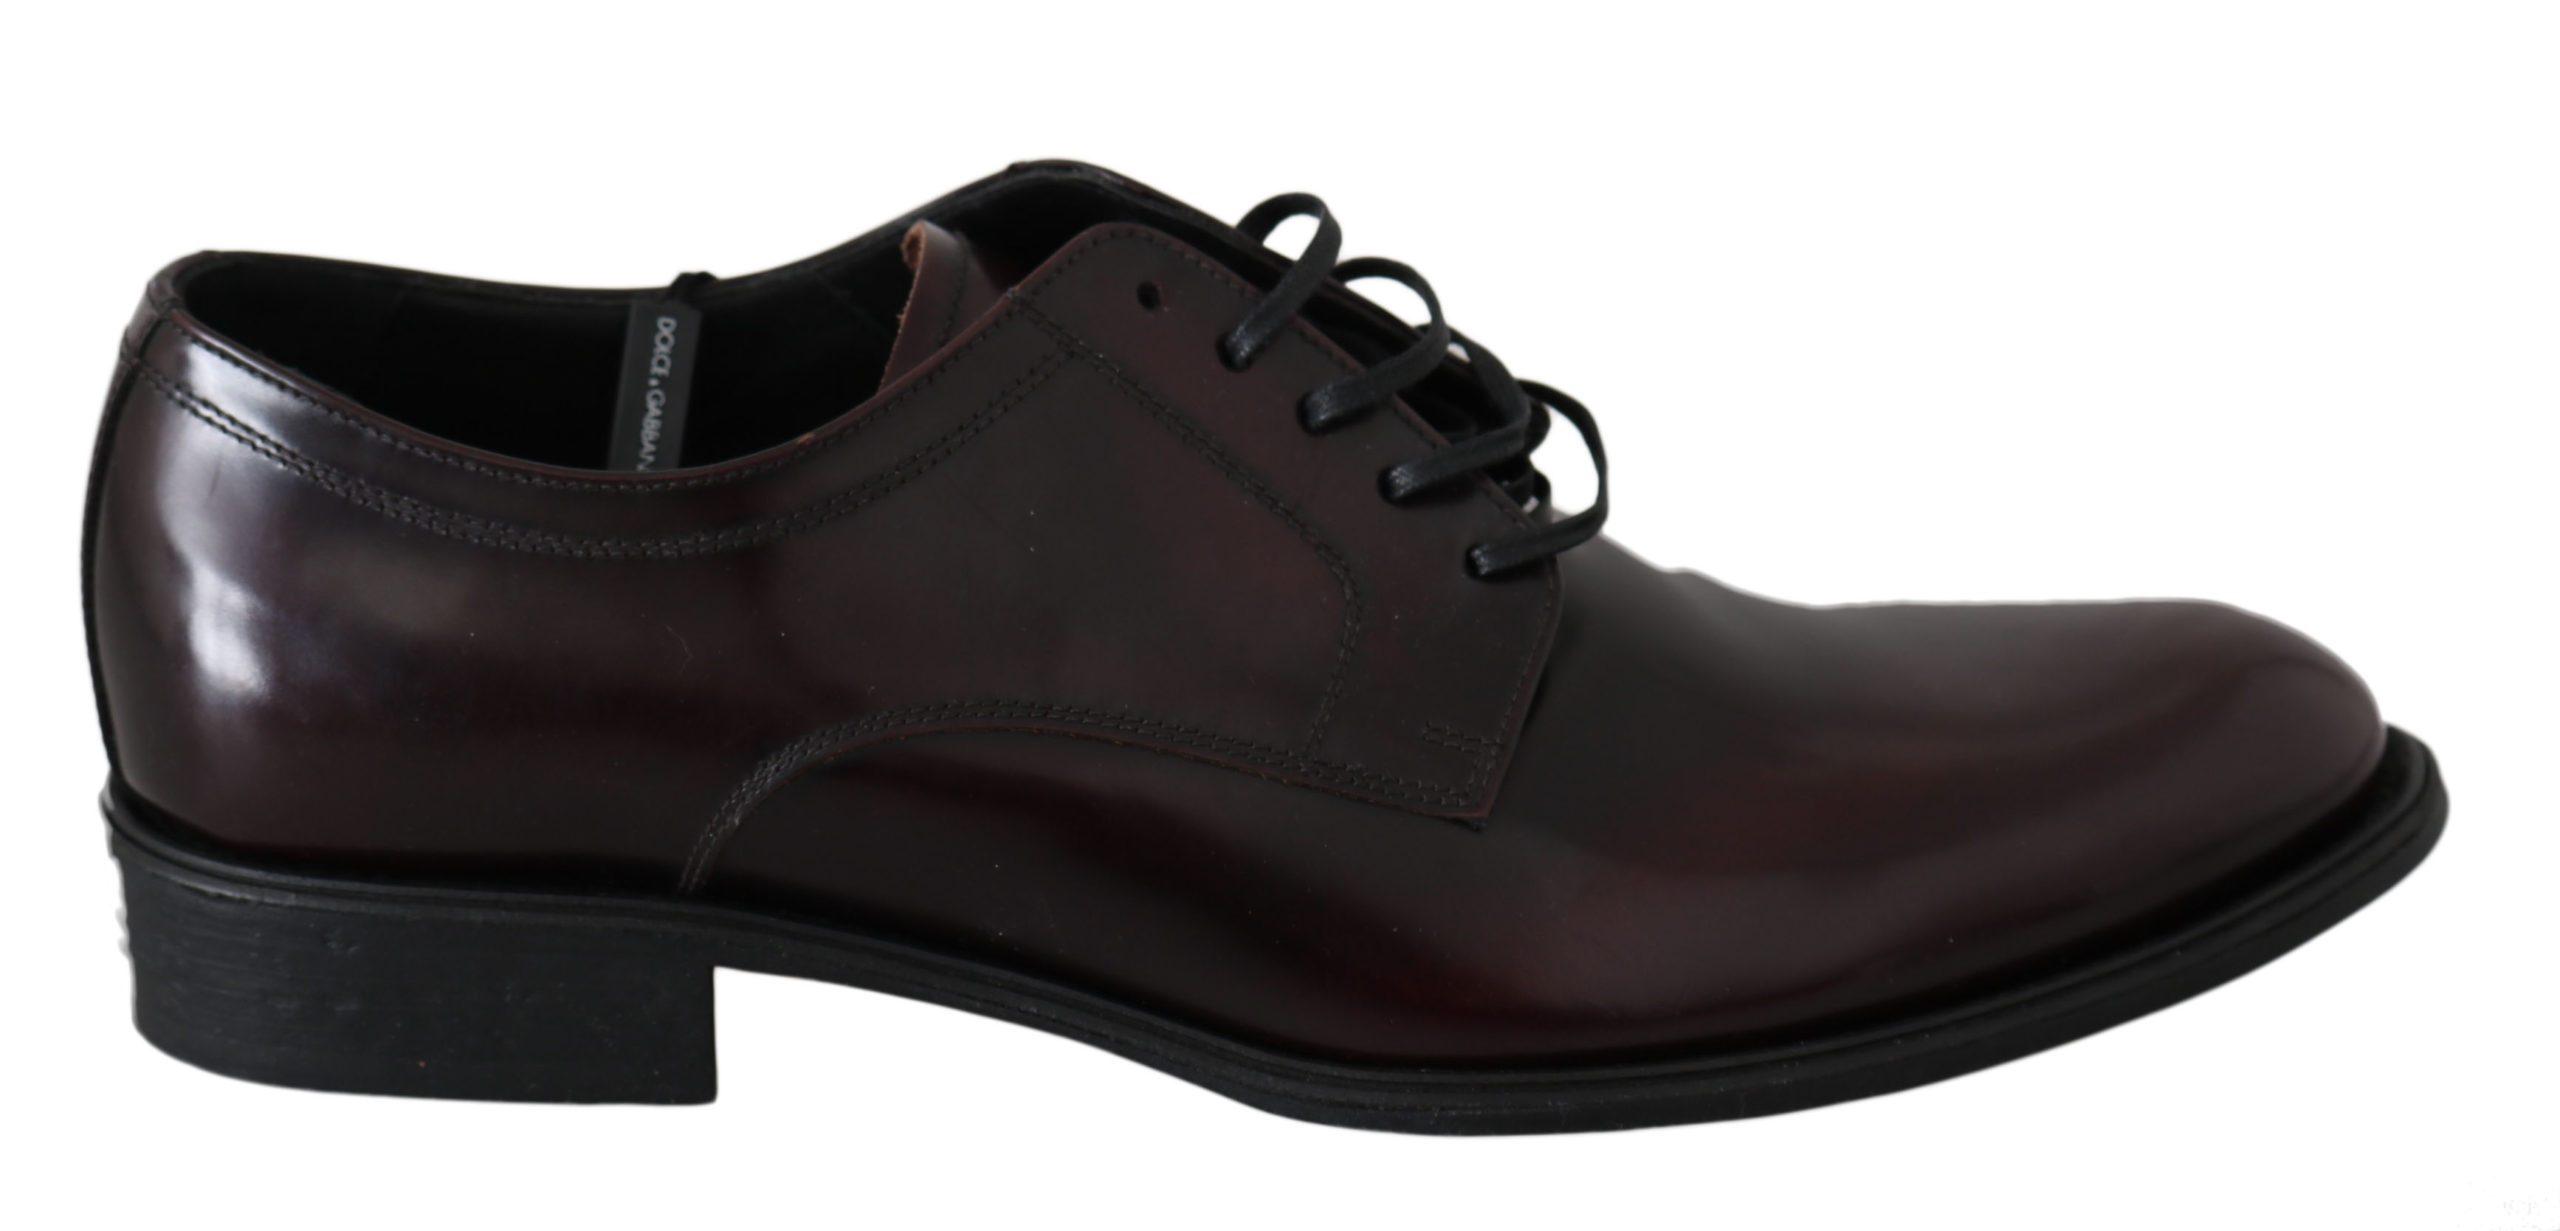 Dolce & Gabbana Men's Leather Dress Oxford Shoe Bordeaux MV2488 - EU40/US7